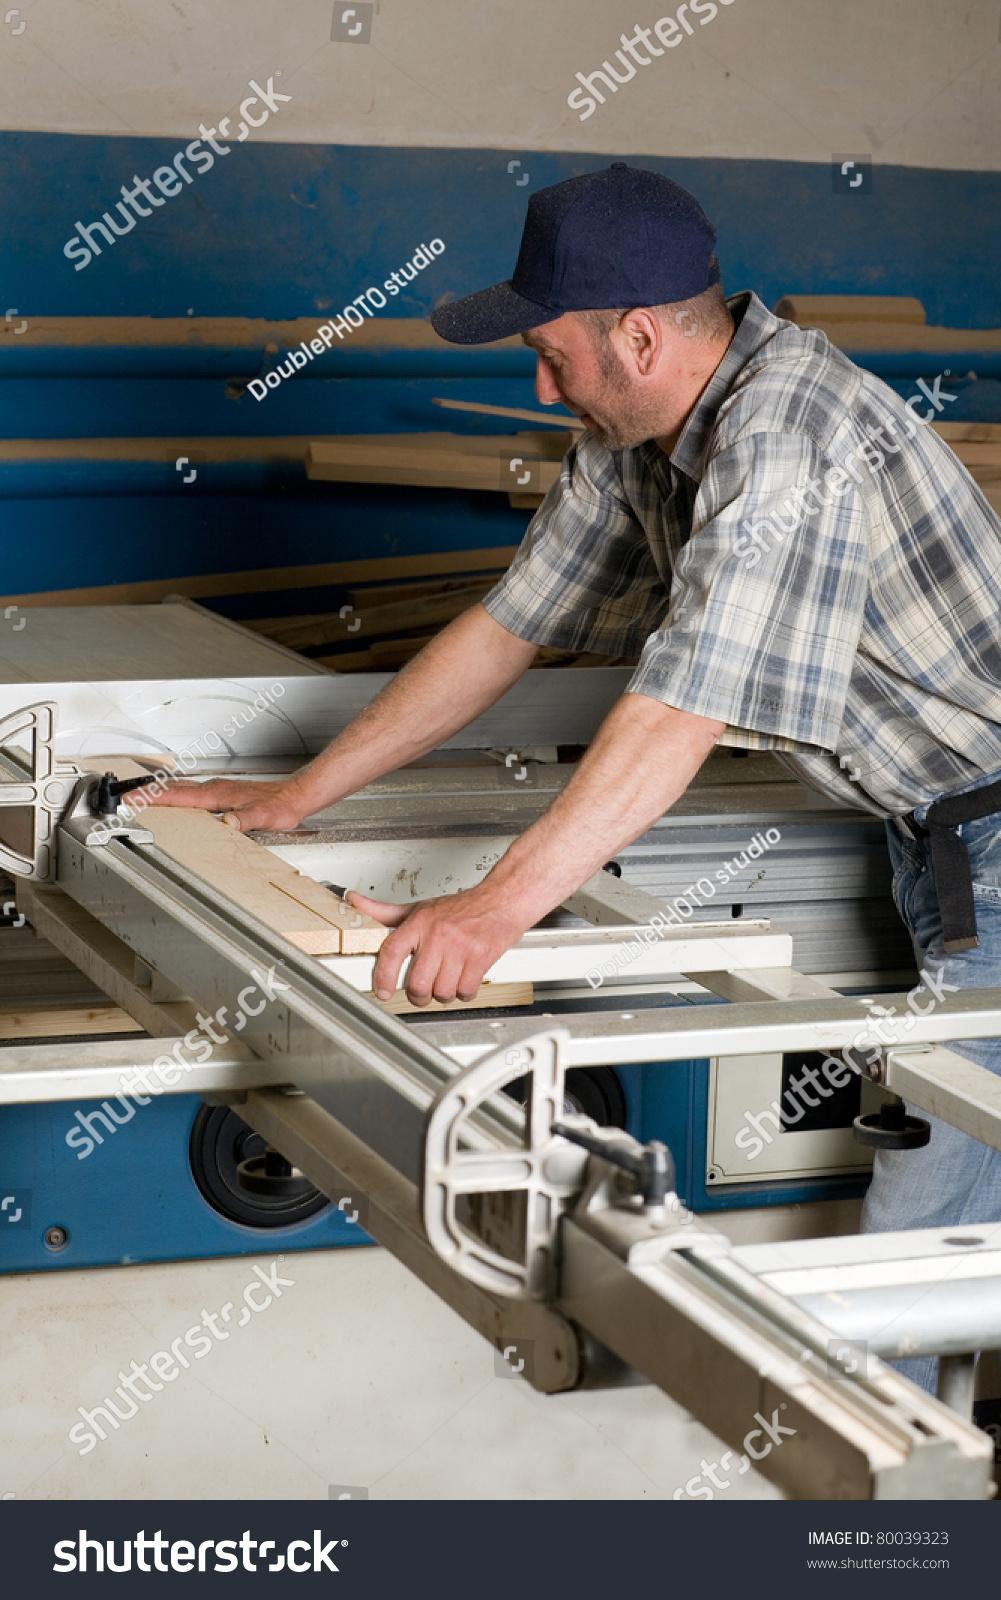 Carpentry Carpenter Woodworker Woodworking Wooden: Carpenter Working On Woodworking Machines In Carpentry